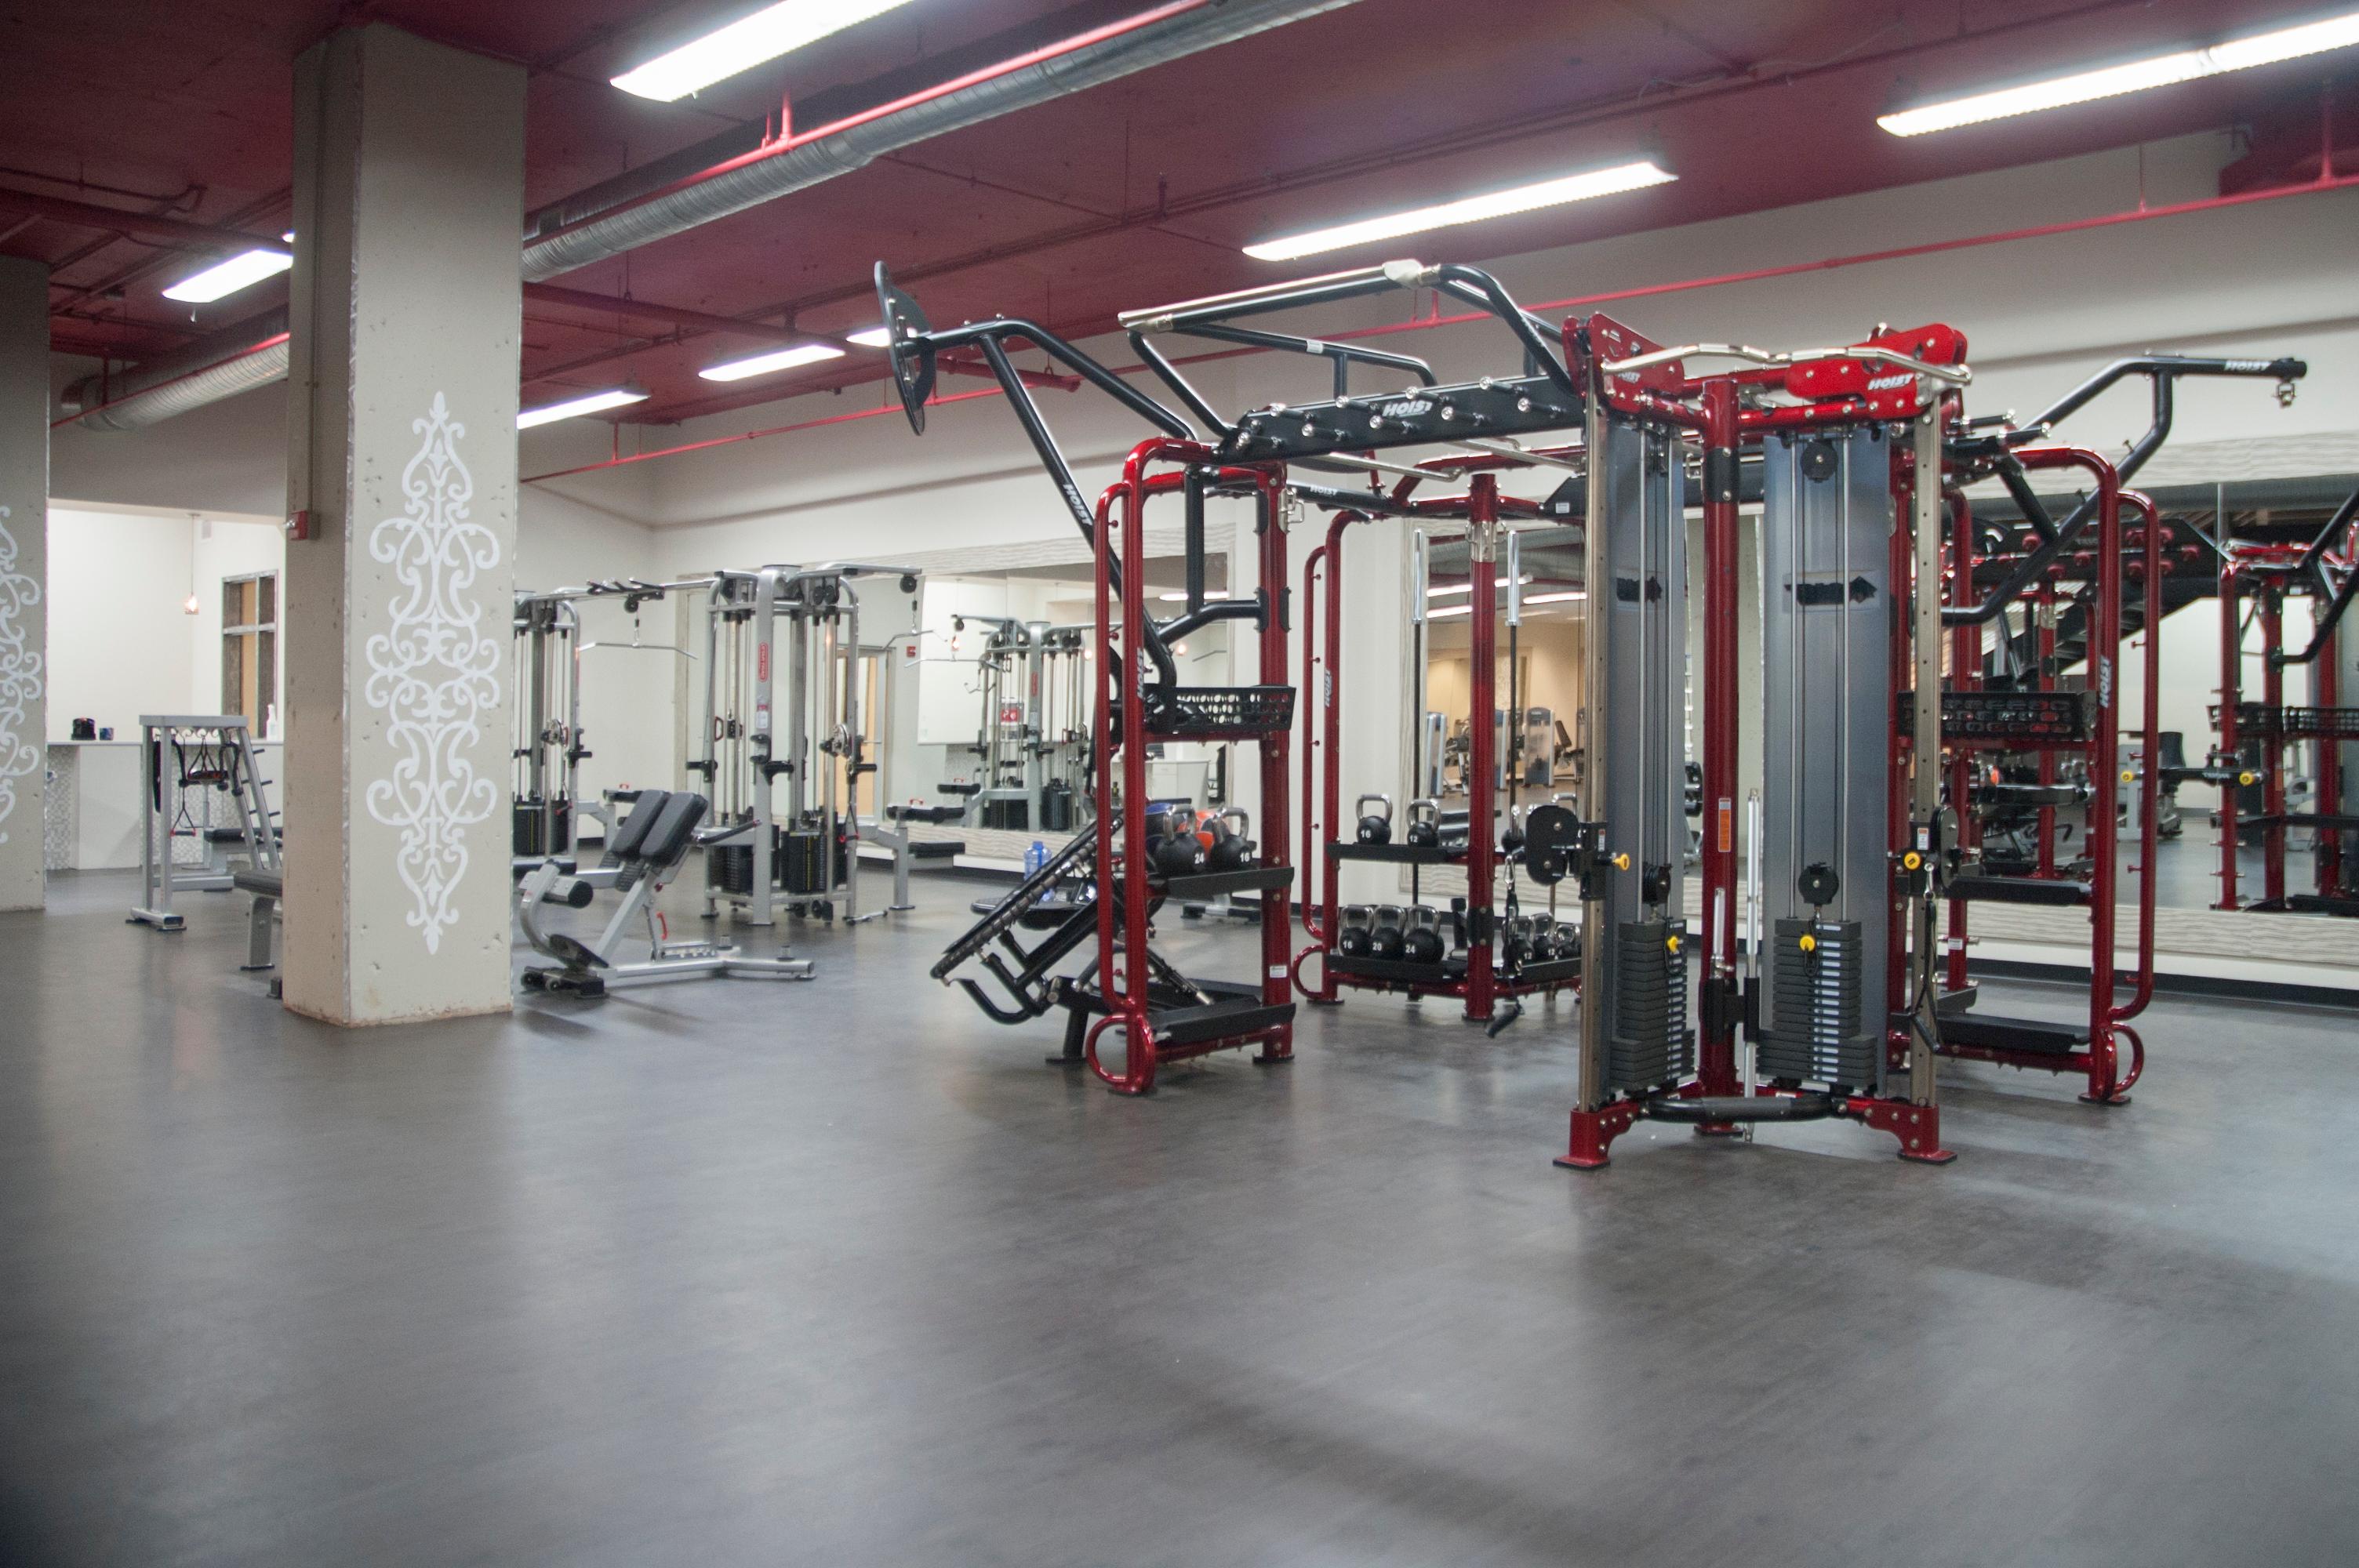 Crunch Fitness - Reston Town Center image 2